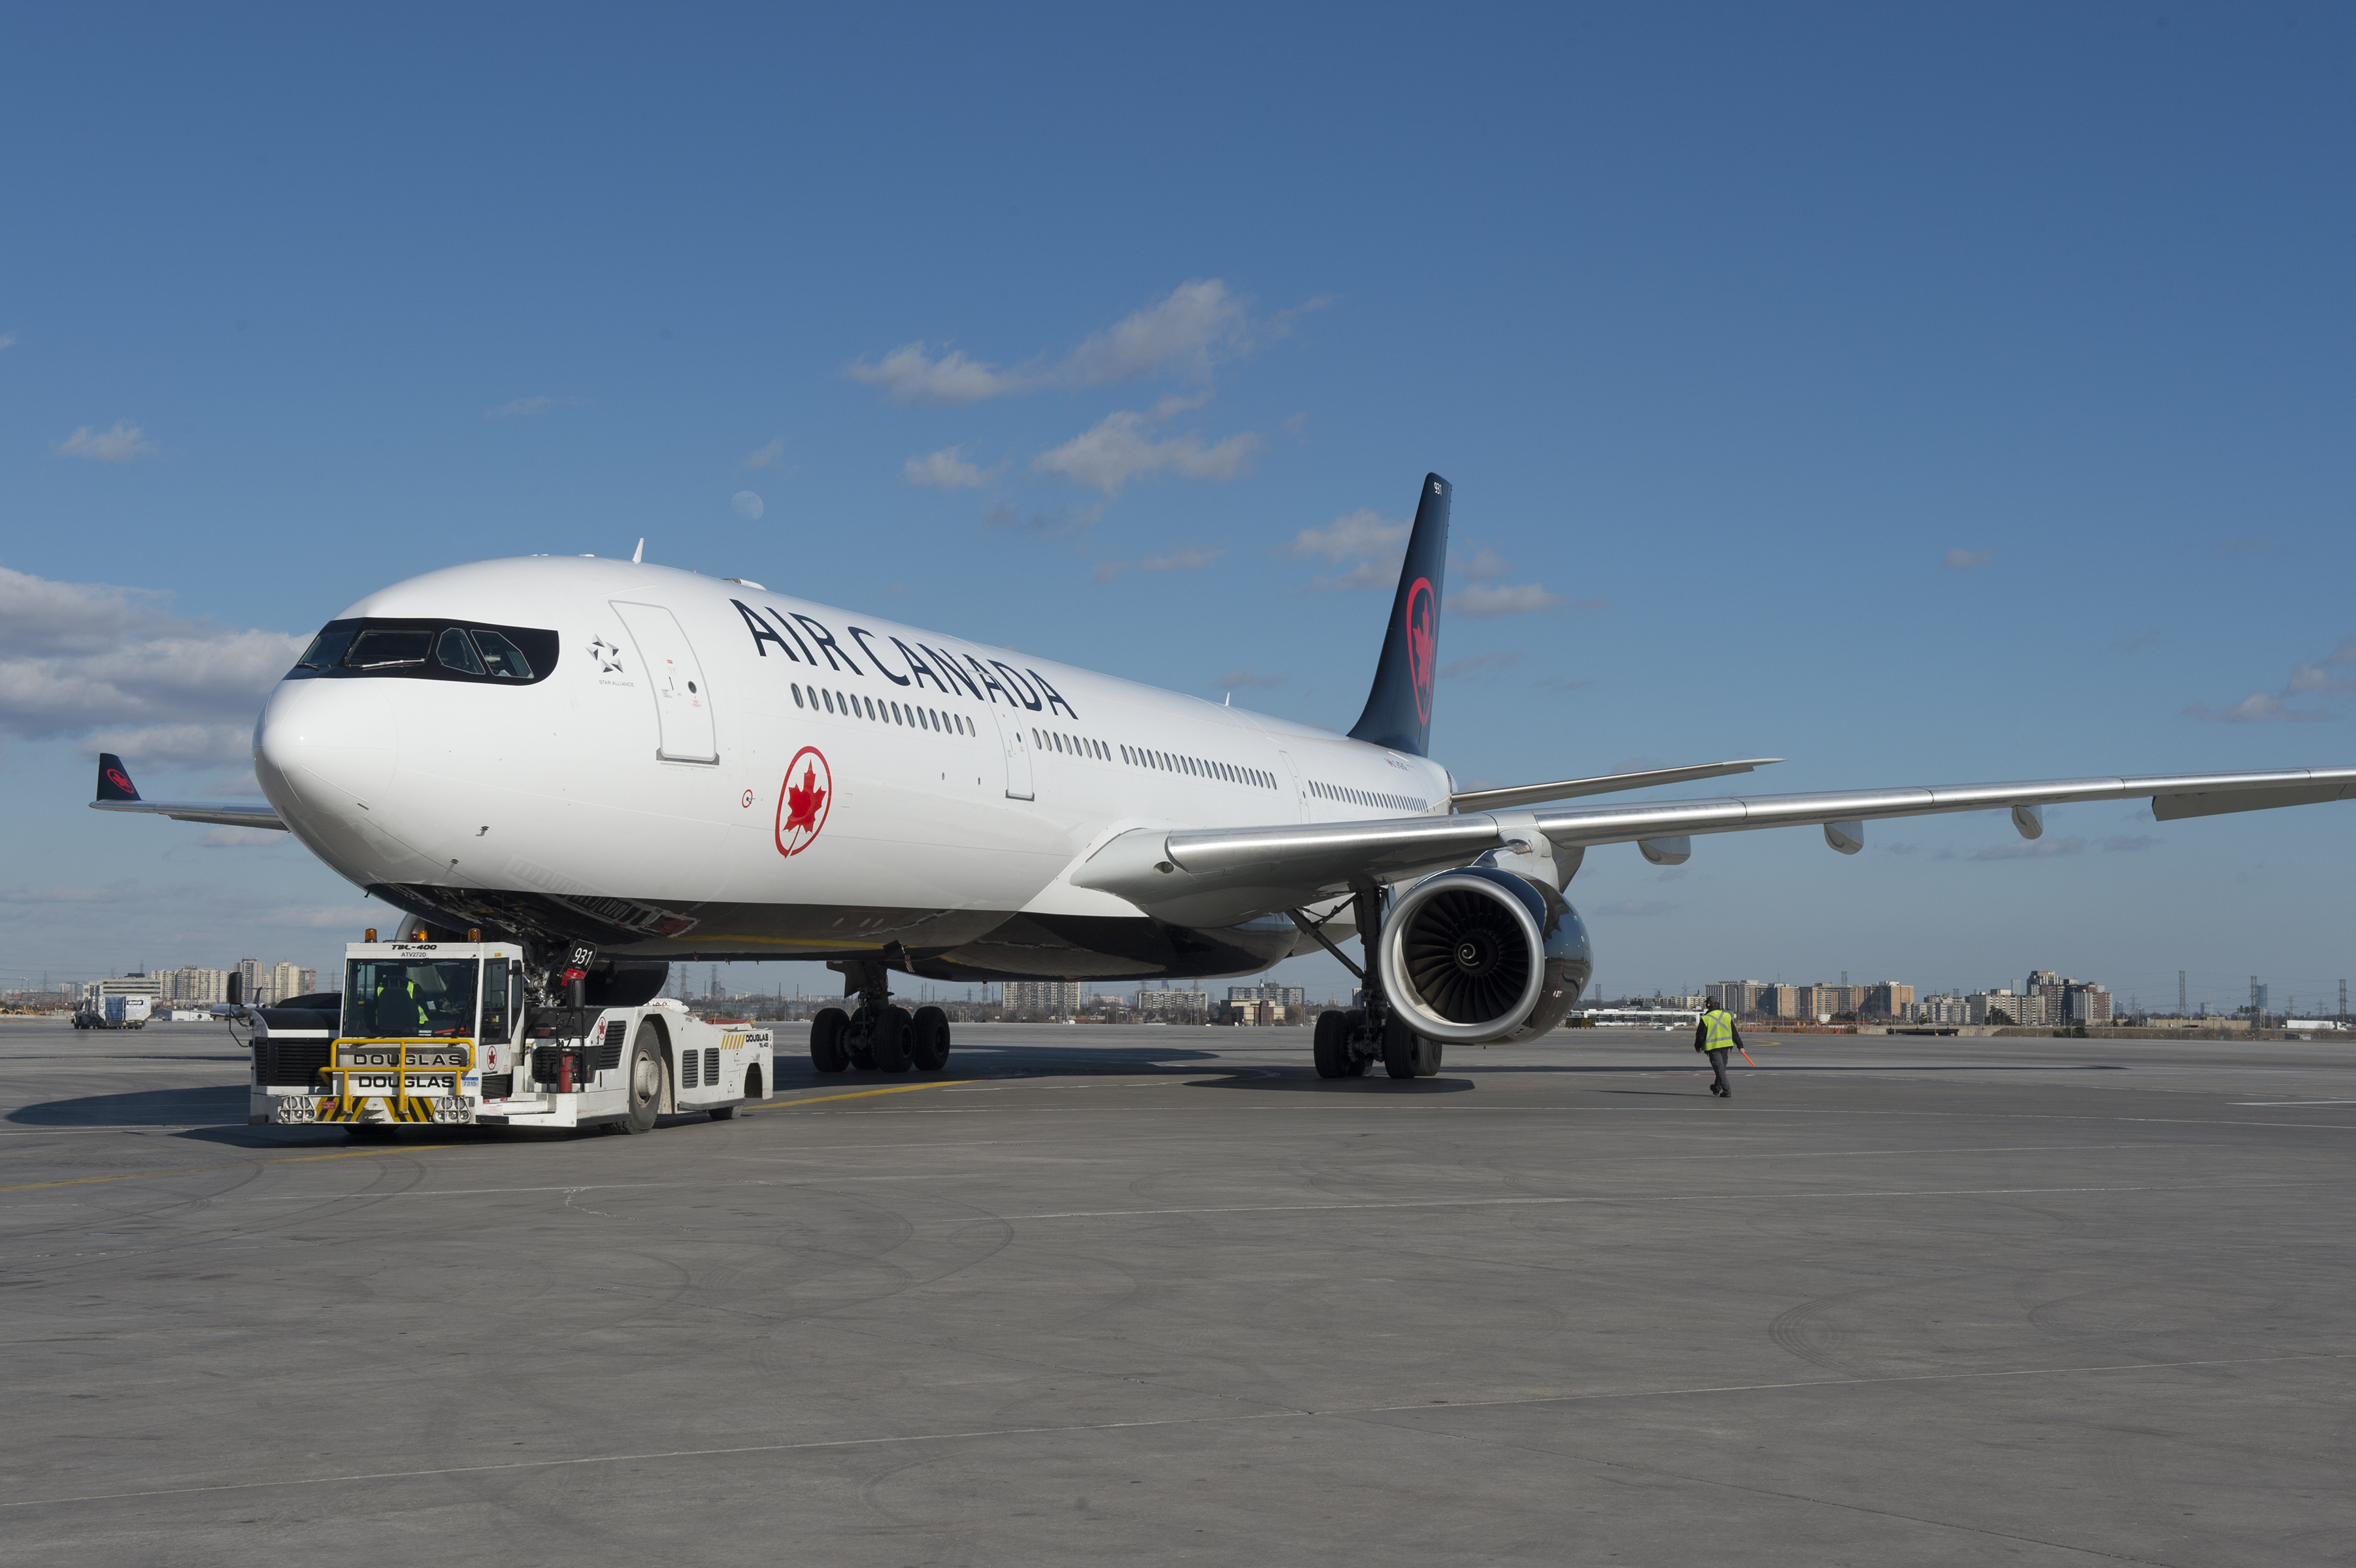 DHC、6月1日から東京ヘリポート発着の遊覧飛行を再開